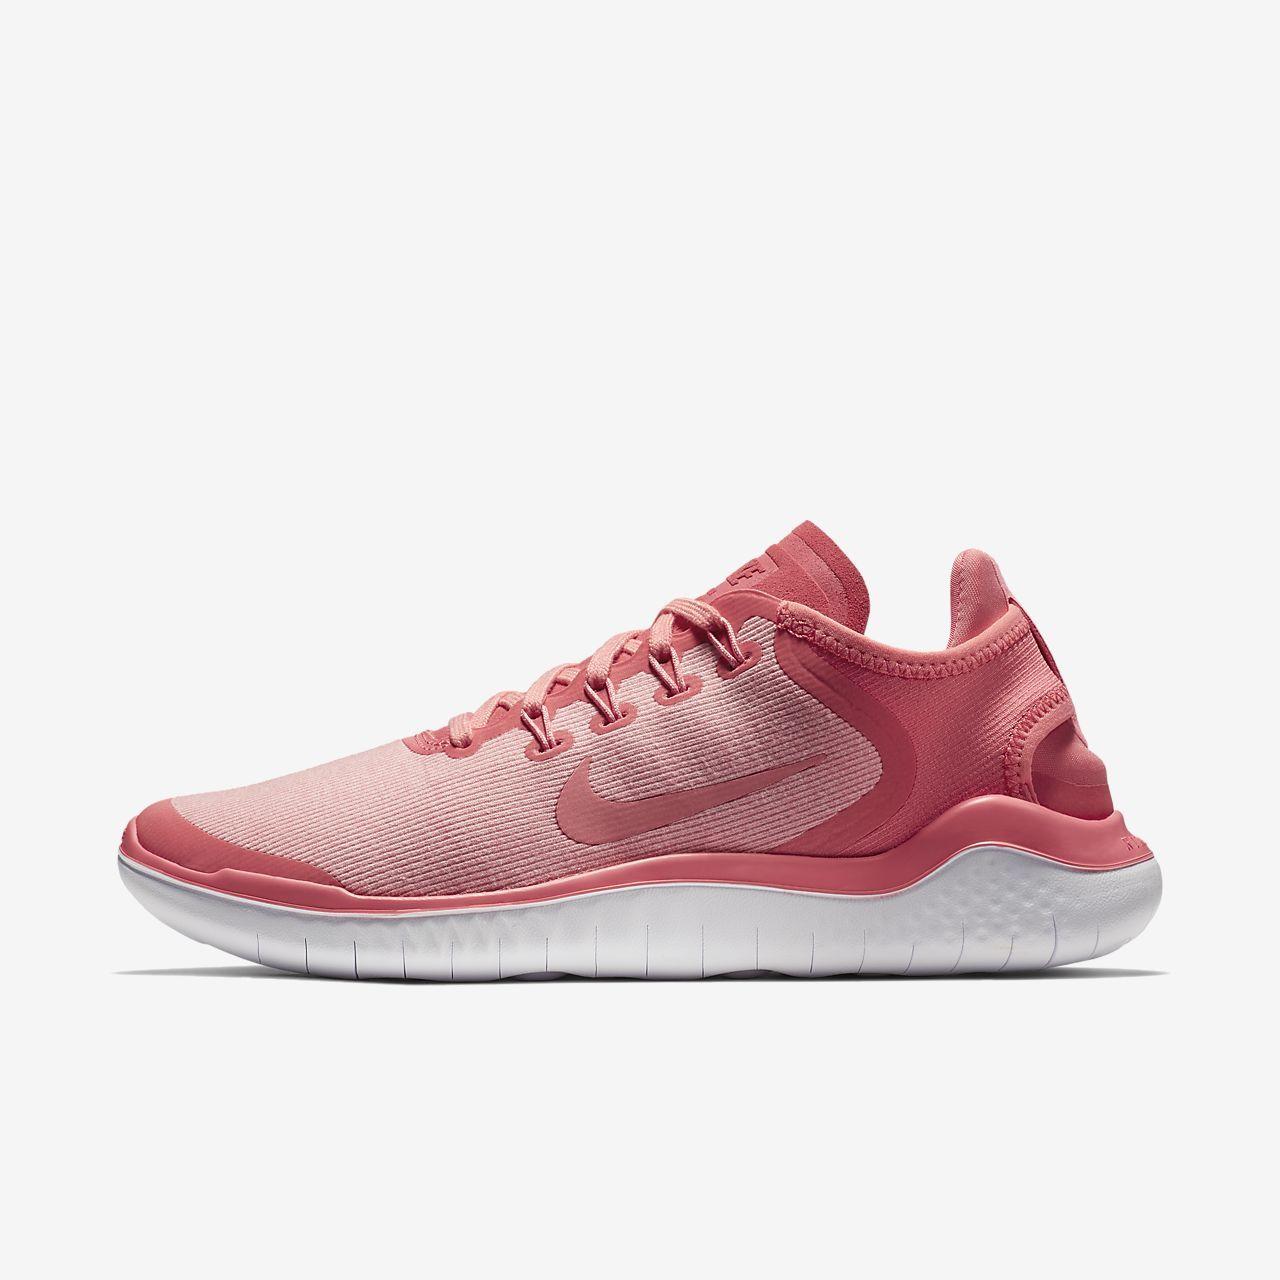 Nike Free RN 2018 Sun Women's Running